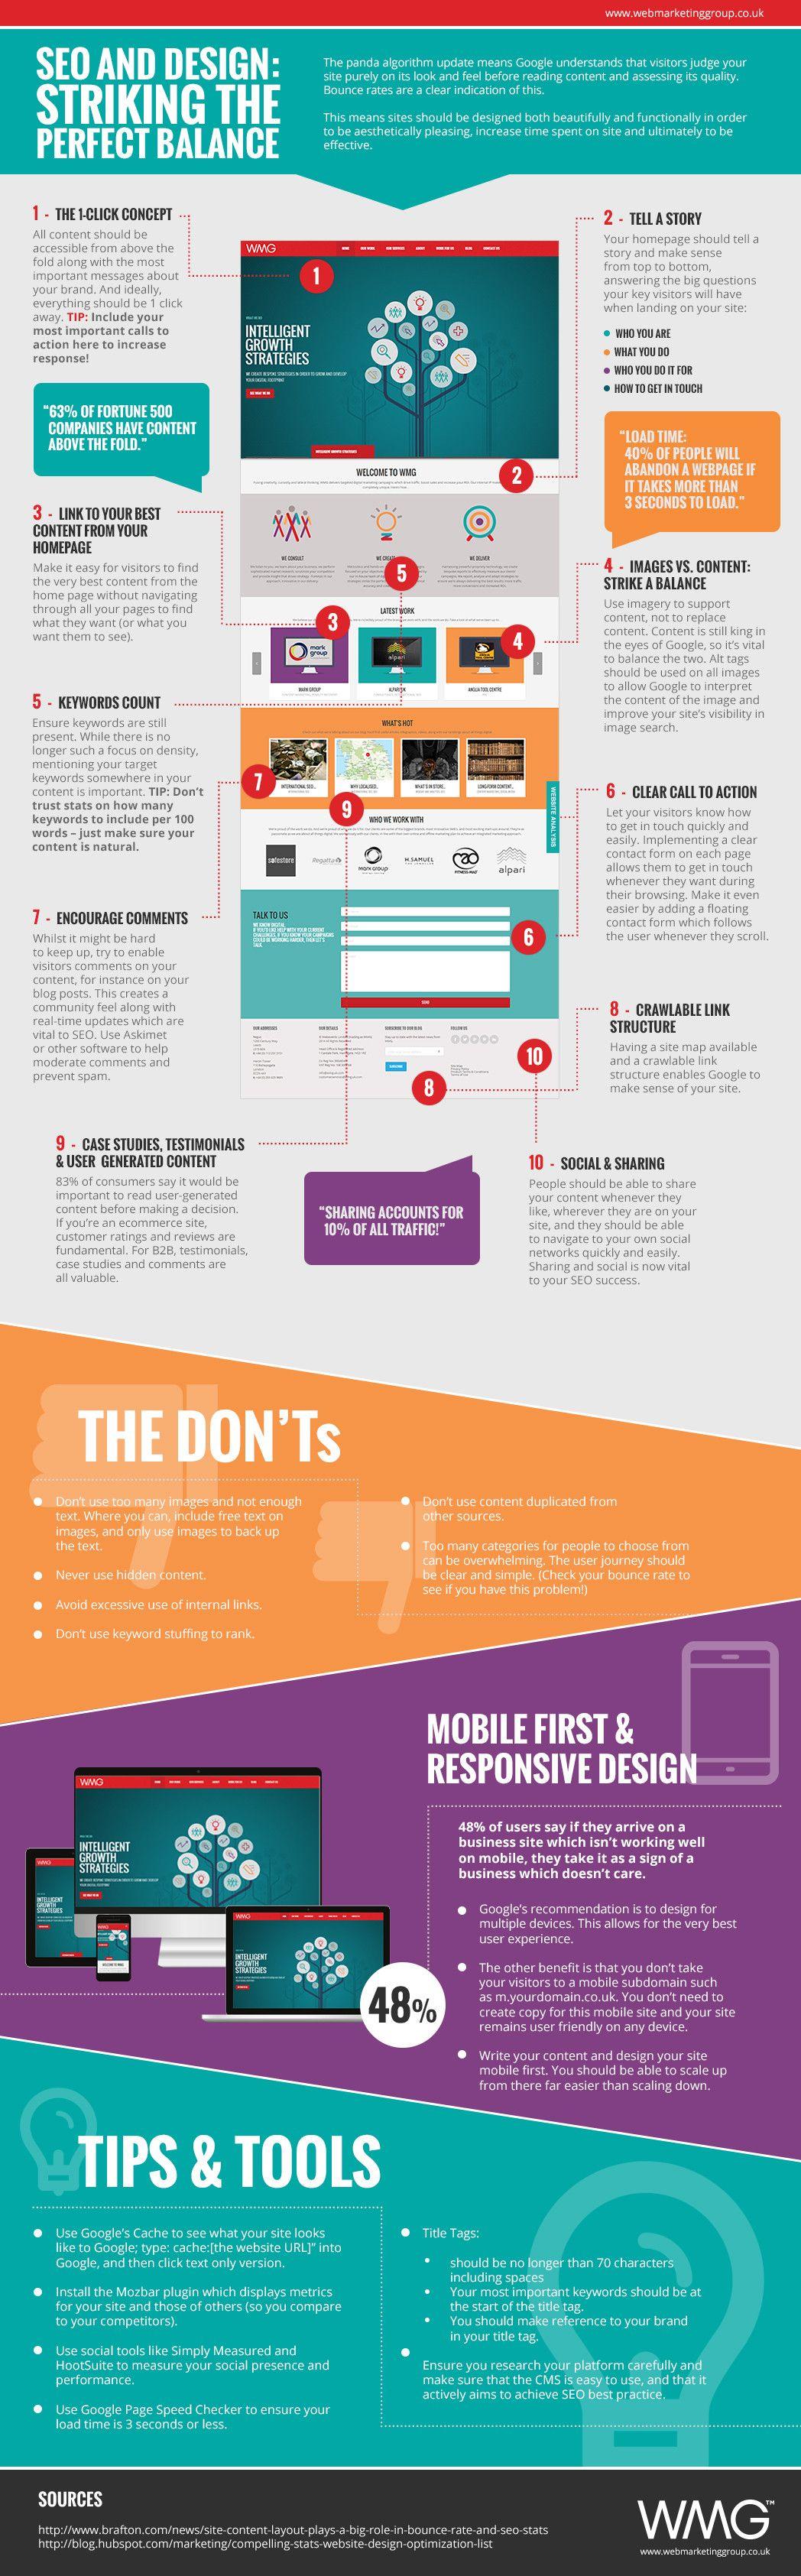 Seo And Design Striking The Perfect Balance Infographic Informationsgrafik Marknadsforing Sociala Medier